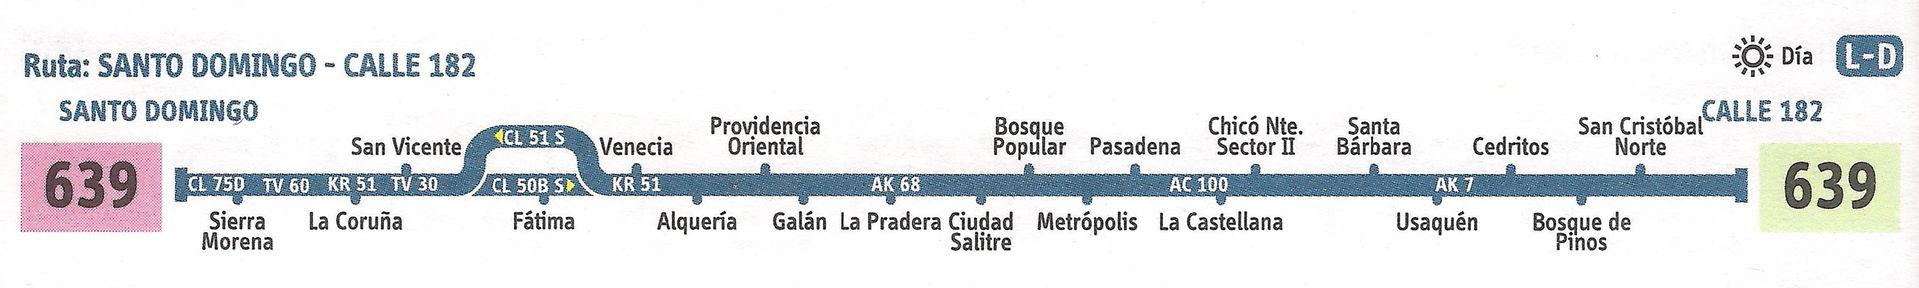 Ruta SITP: 639 Calle 182 ↔ Santo Domingo [Urbana] 3